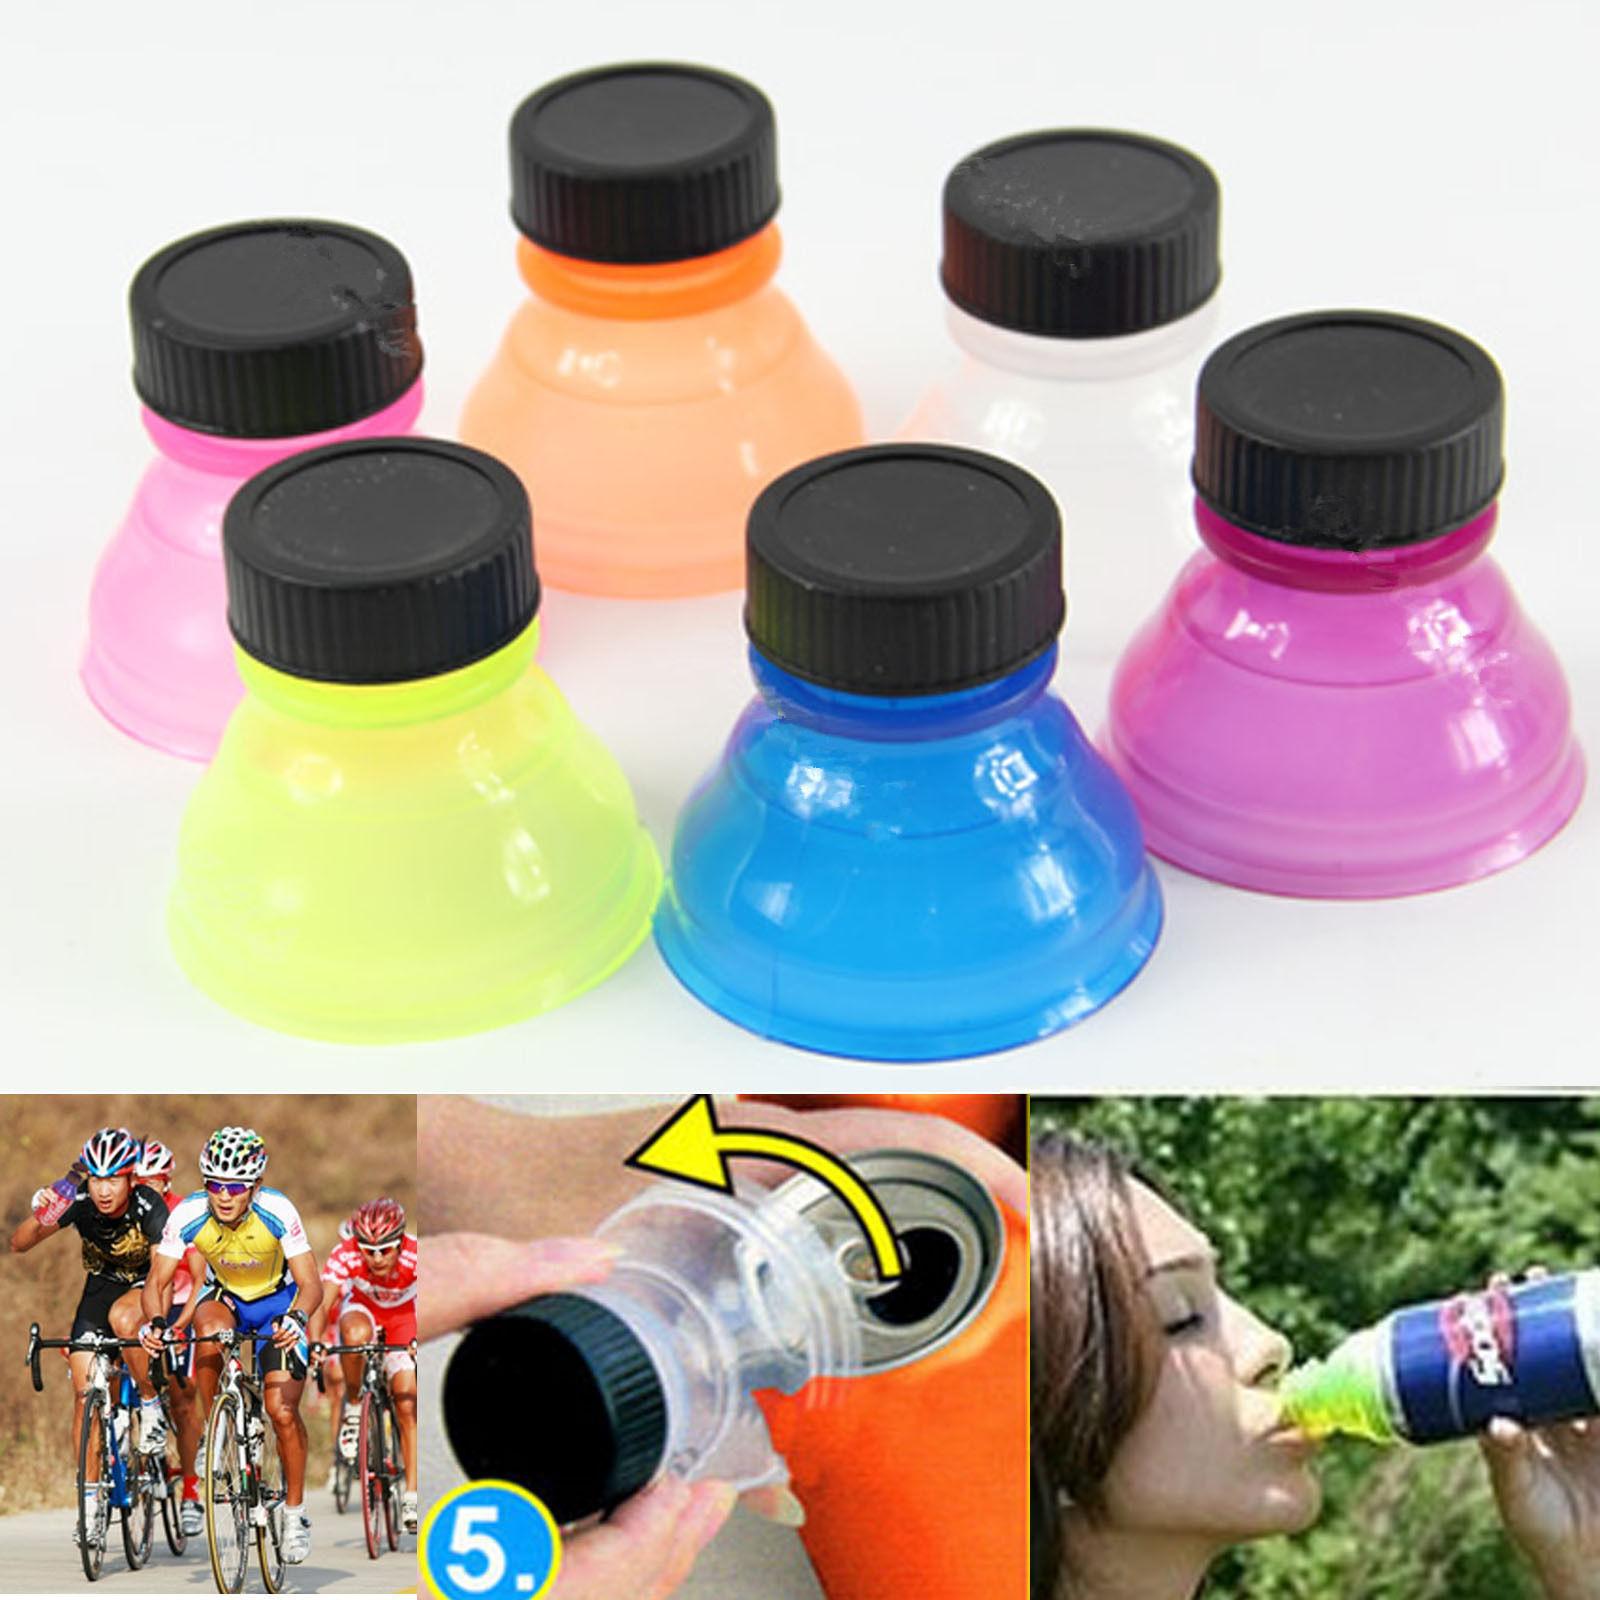 Фото бутылки банки в попе 10 фотография